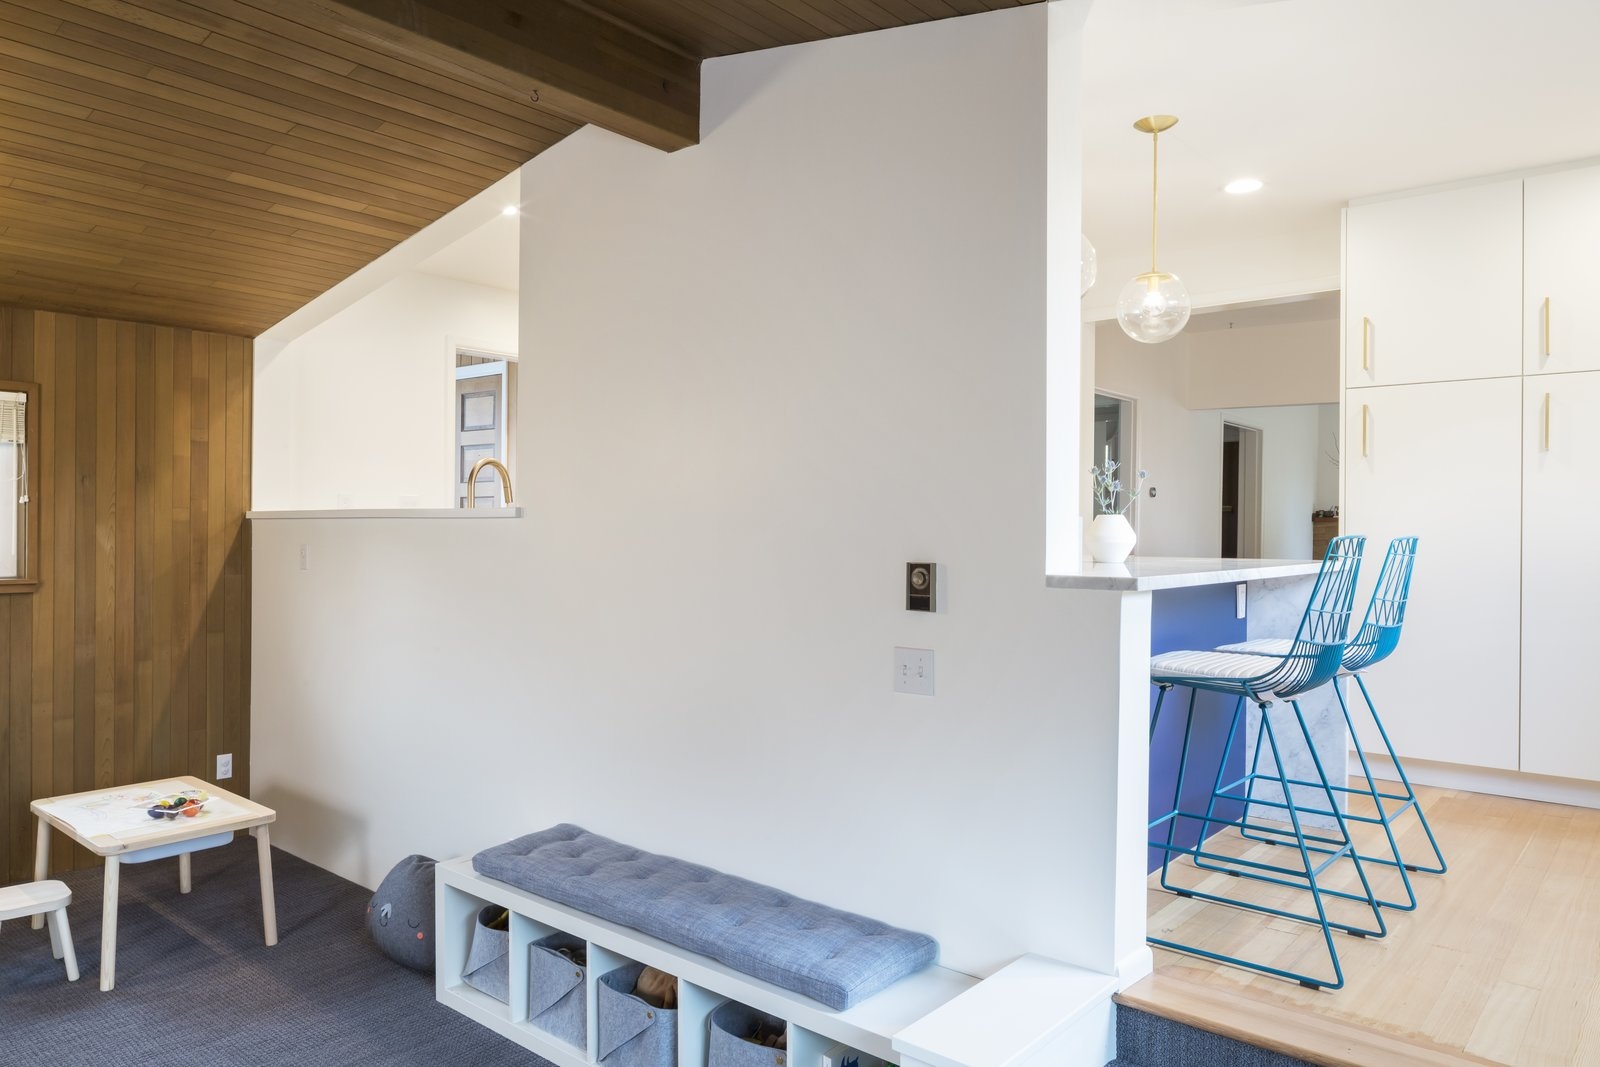 70s Kitchen U0026 Living Room Goes Modern Geometric